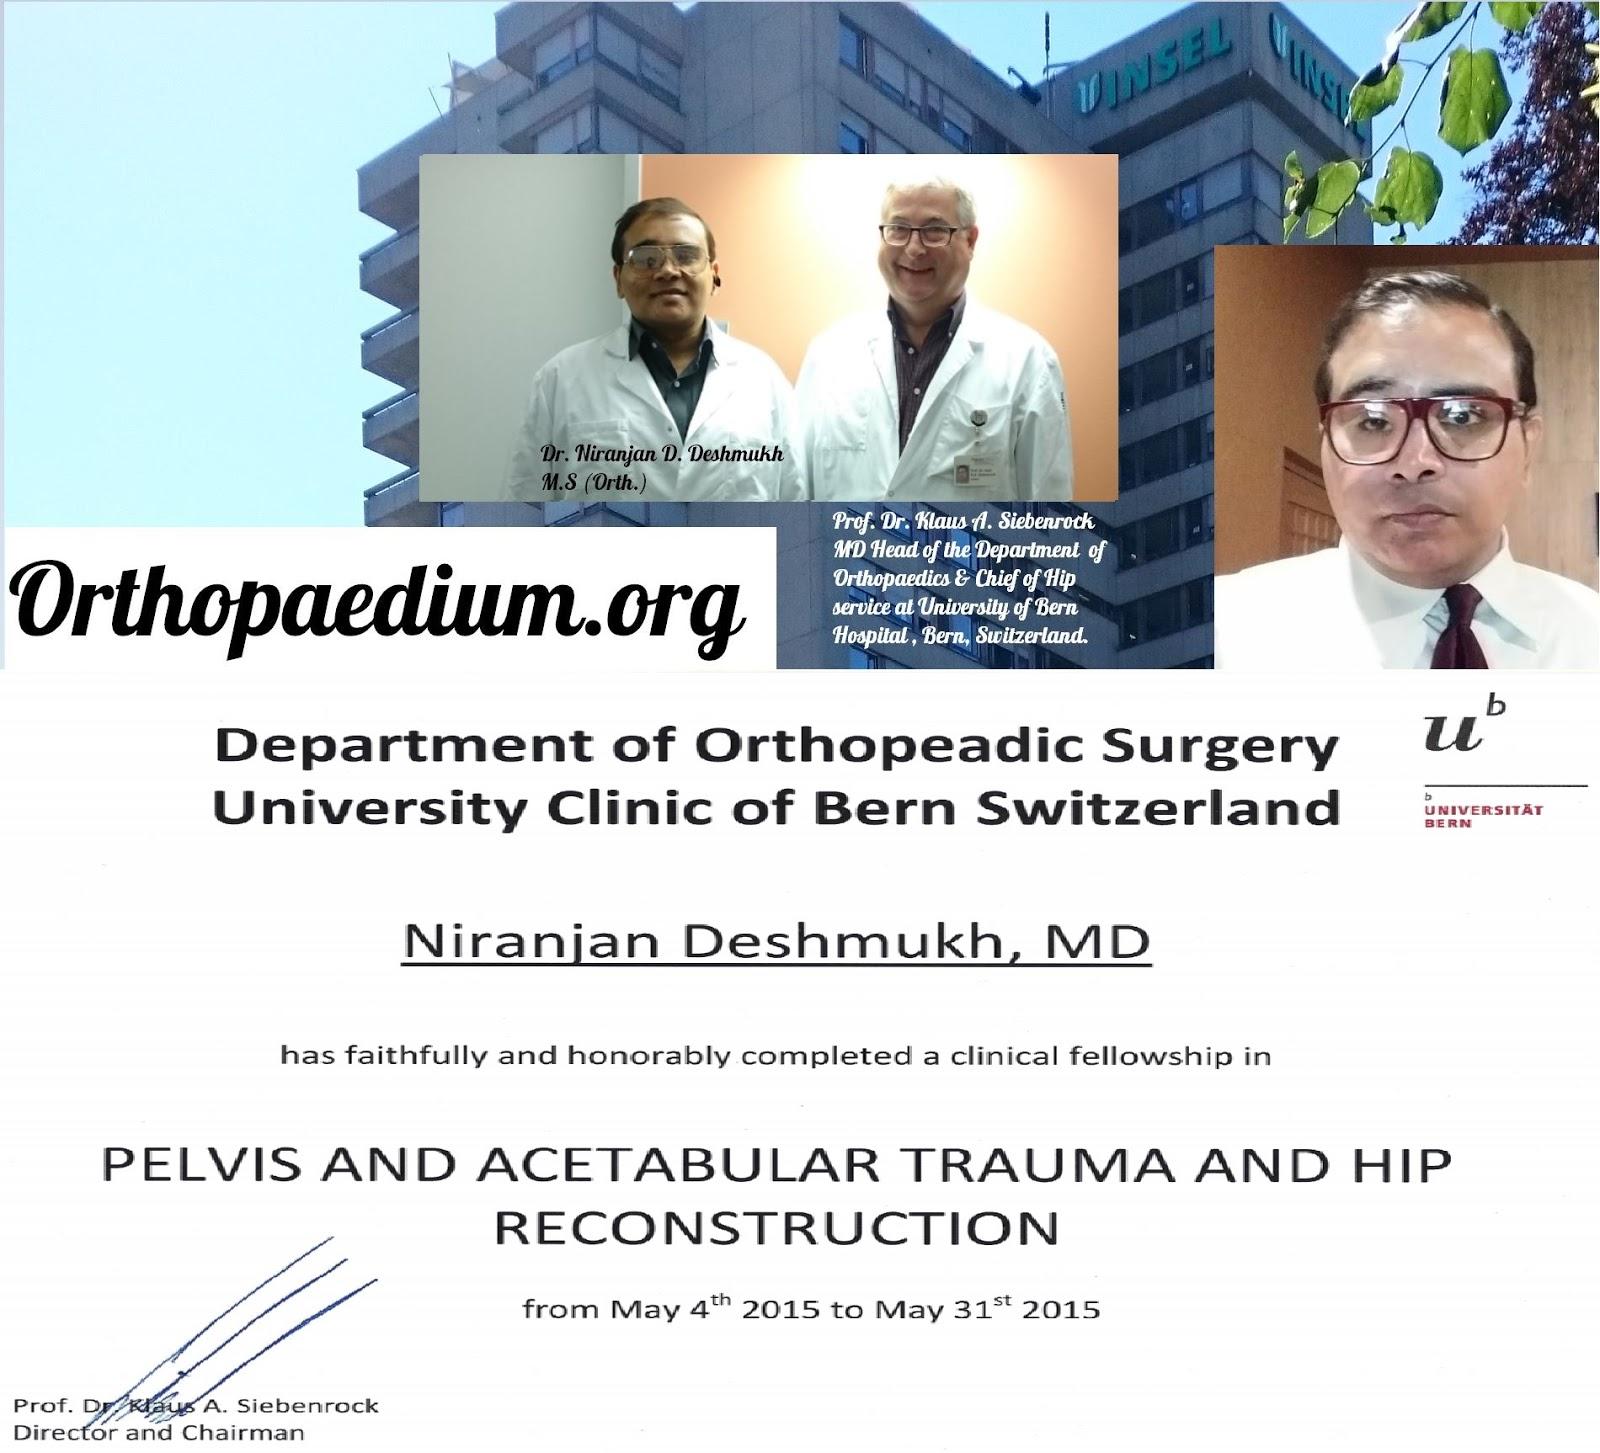 Dr Niranjan Deshmukh|Orthopedic Surgeon|Spine|Hip Ankle Knee